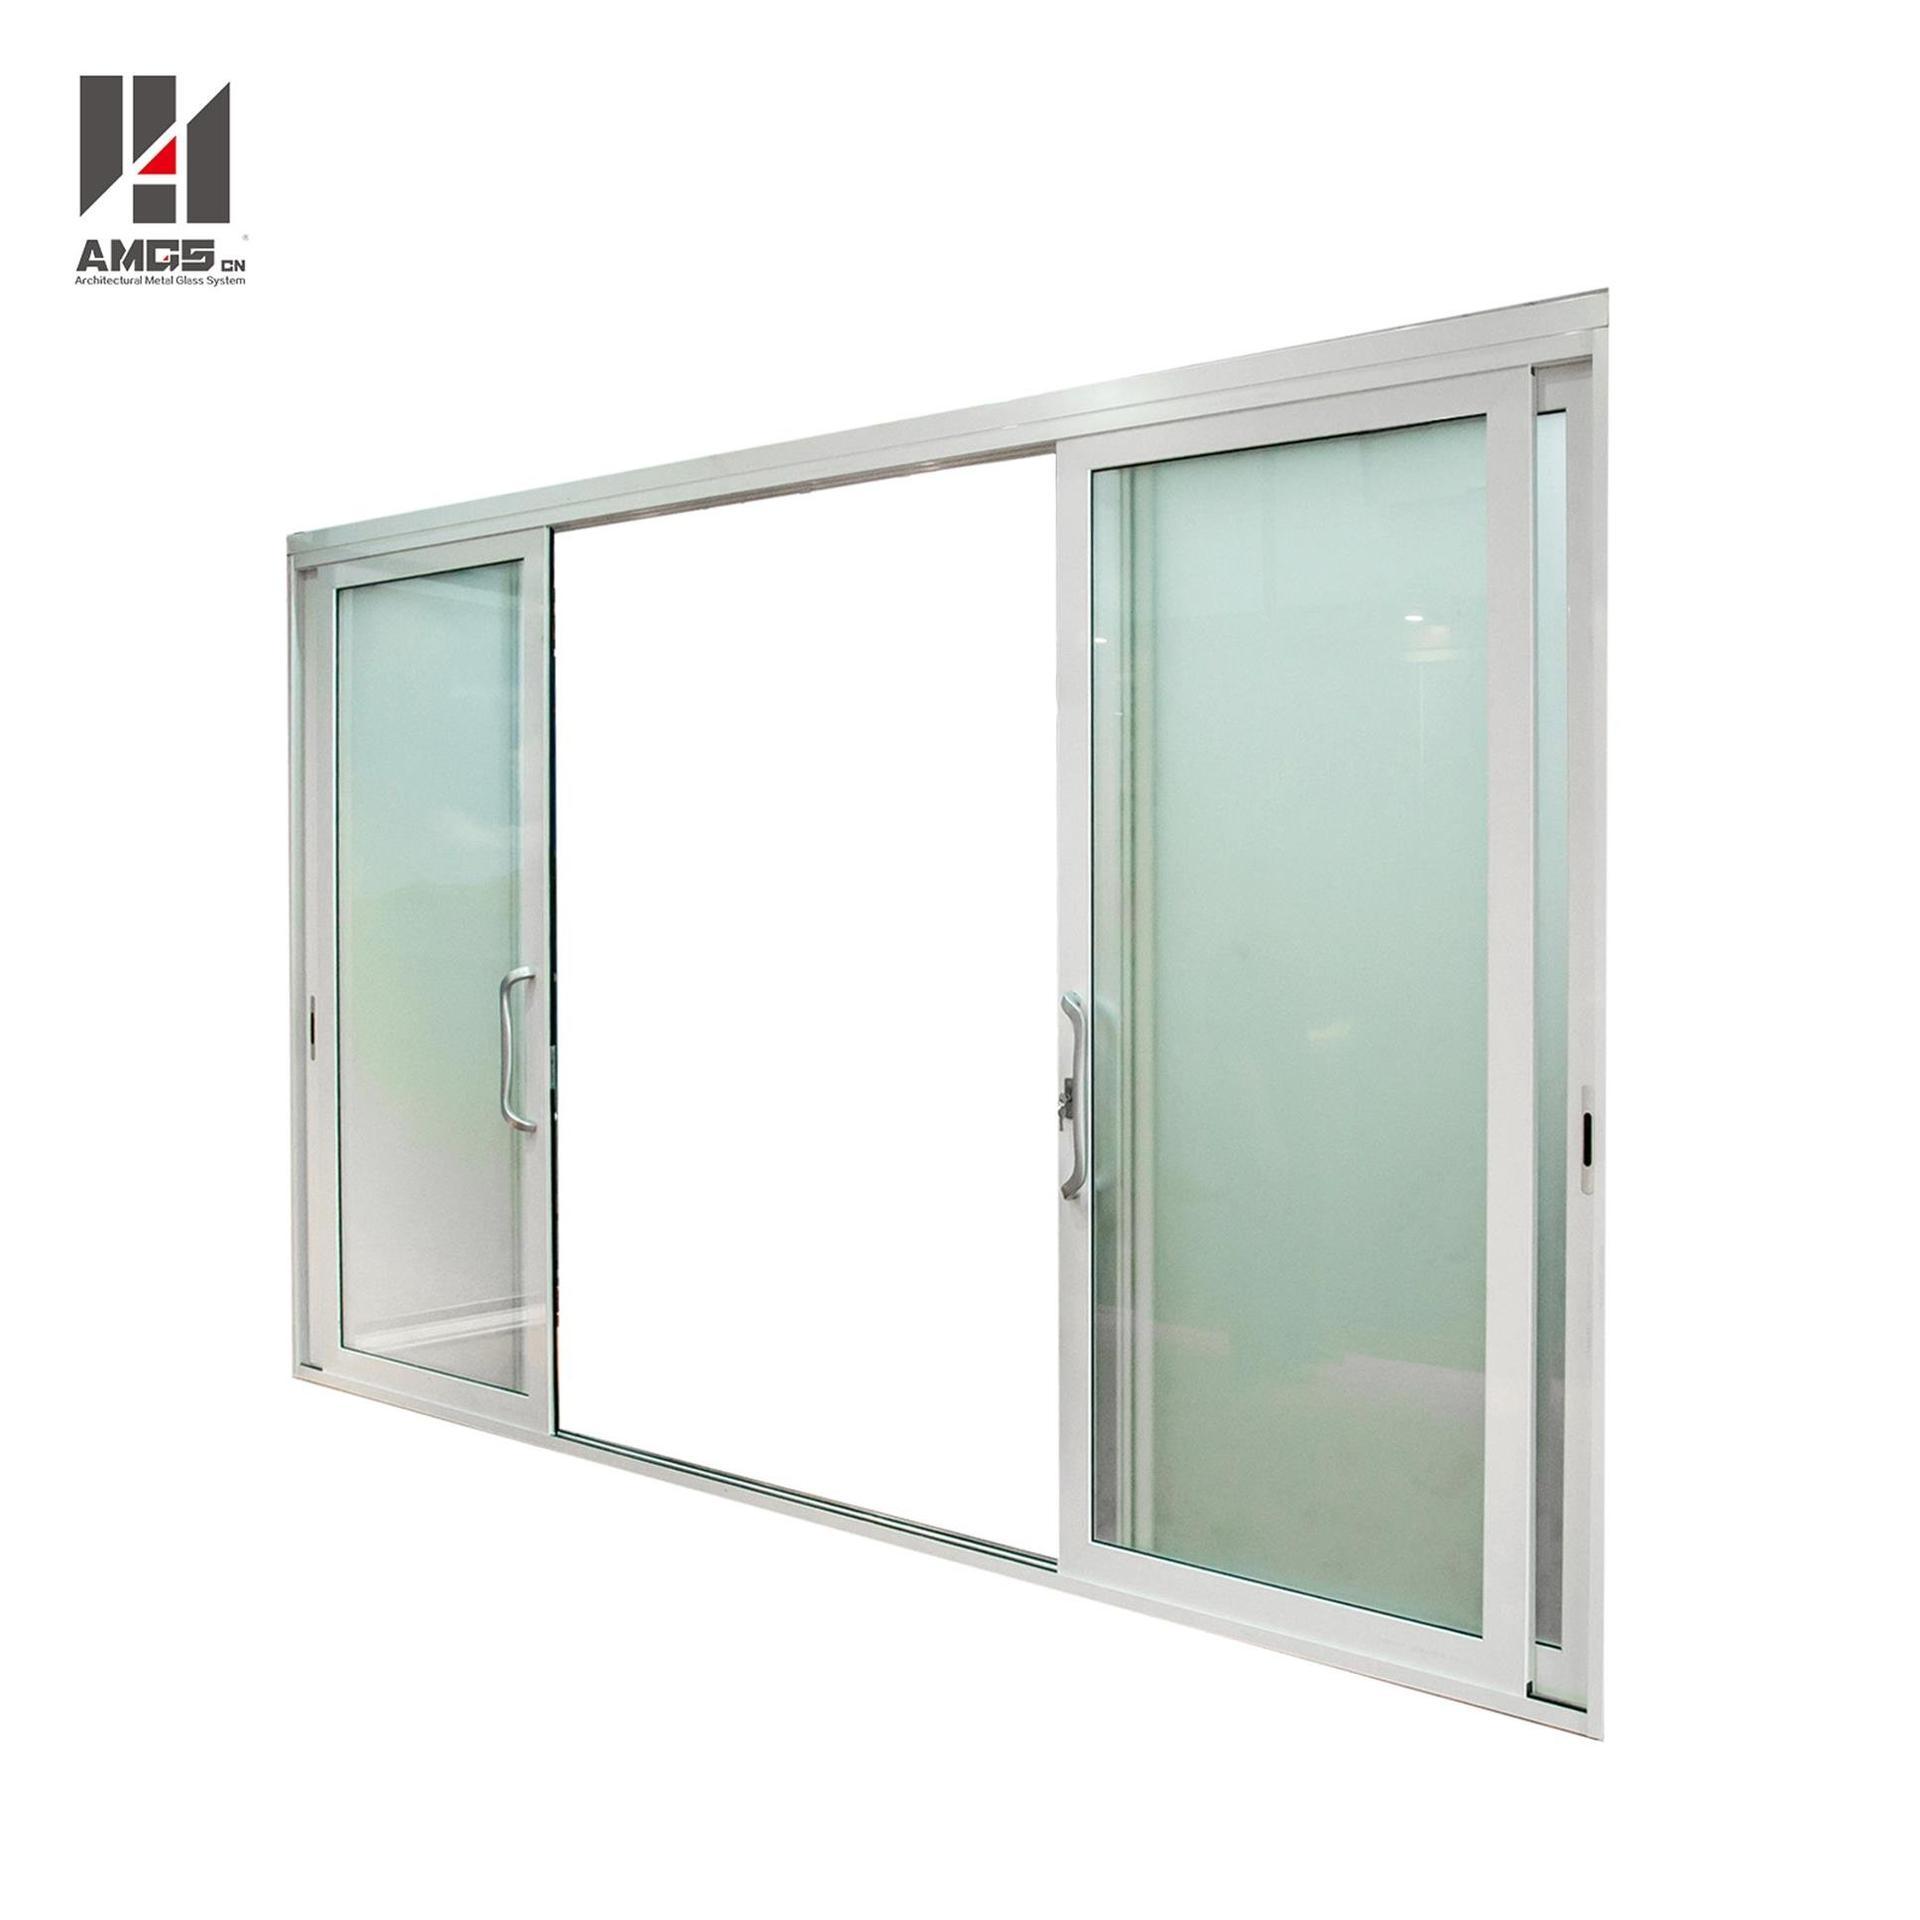 White Aluminium Sliding Door With Single Or Double Glazing